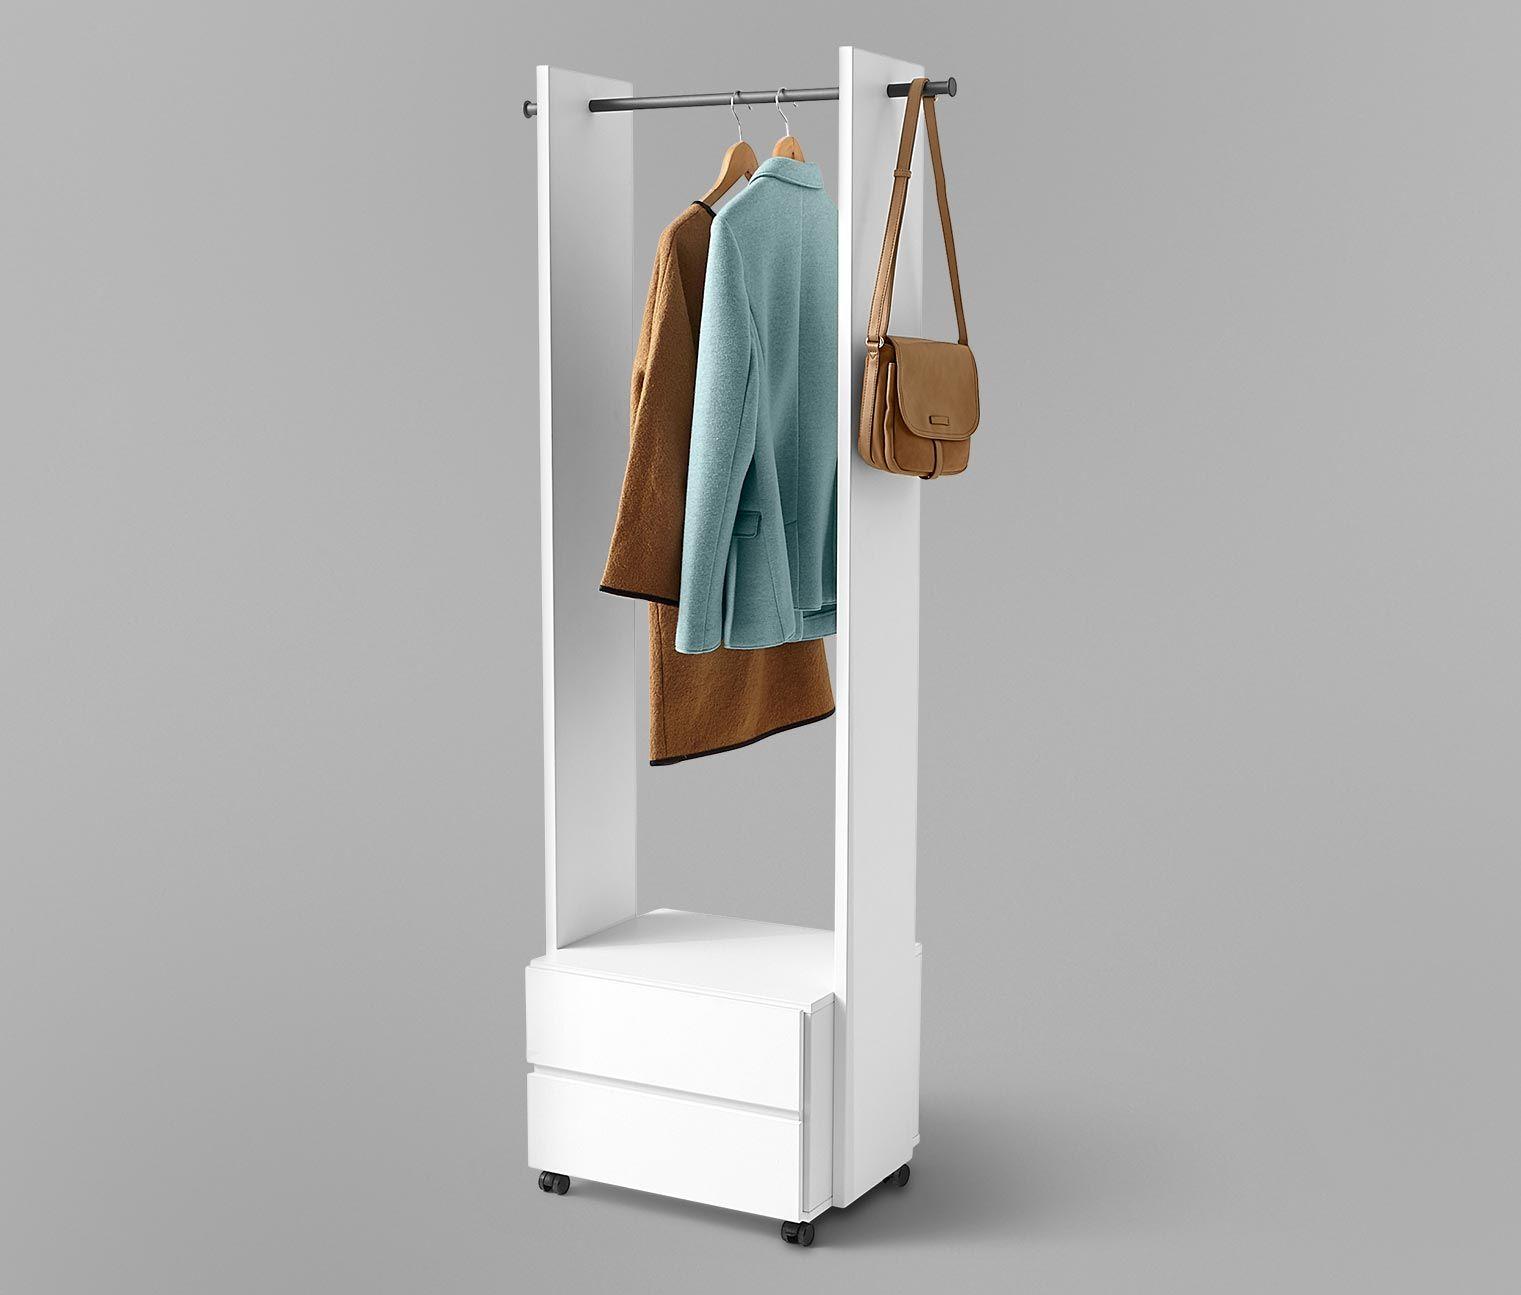 ordnungswagen online bestellen bei tchibo 314926 tiny home pinterest. Black Bedroom Furniture Sets. Home Design Ideas